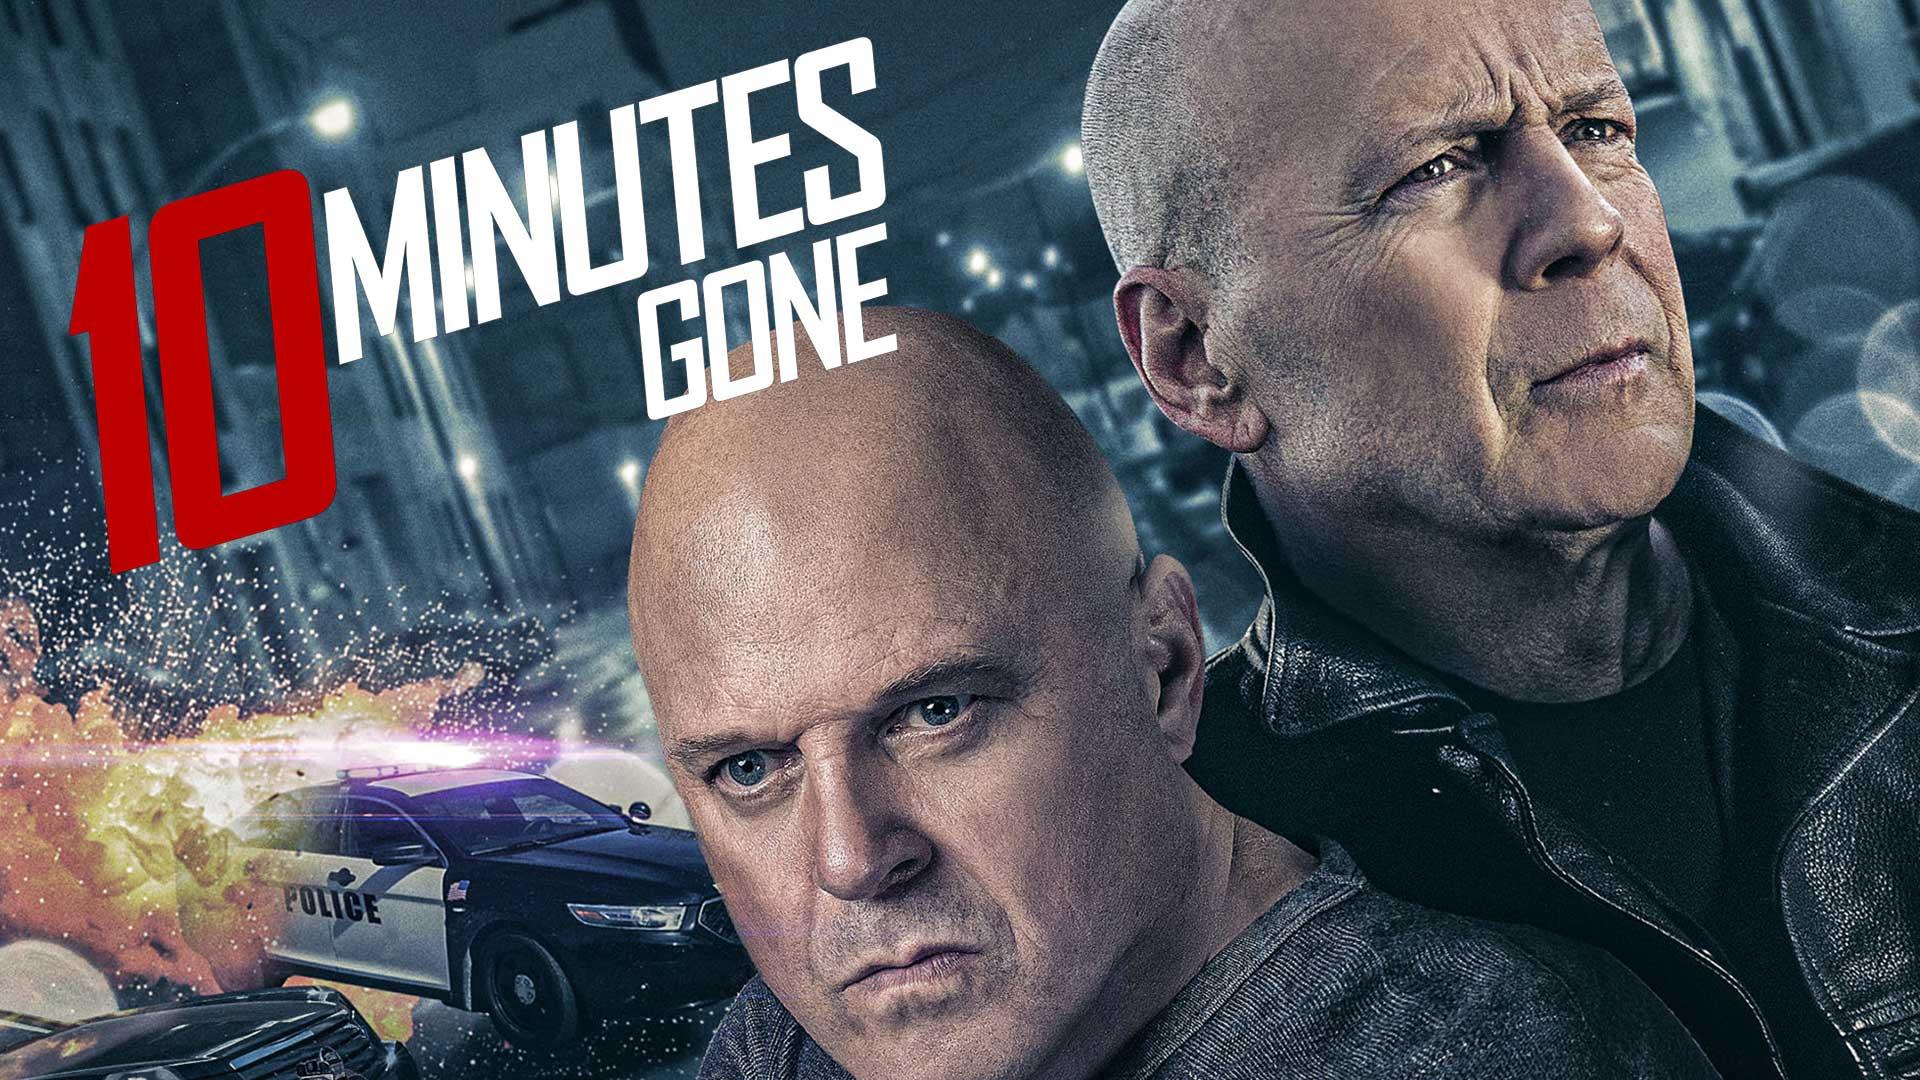 10 Minutes Gone (4K UHD)